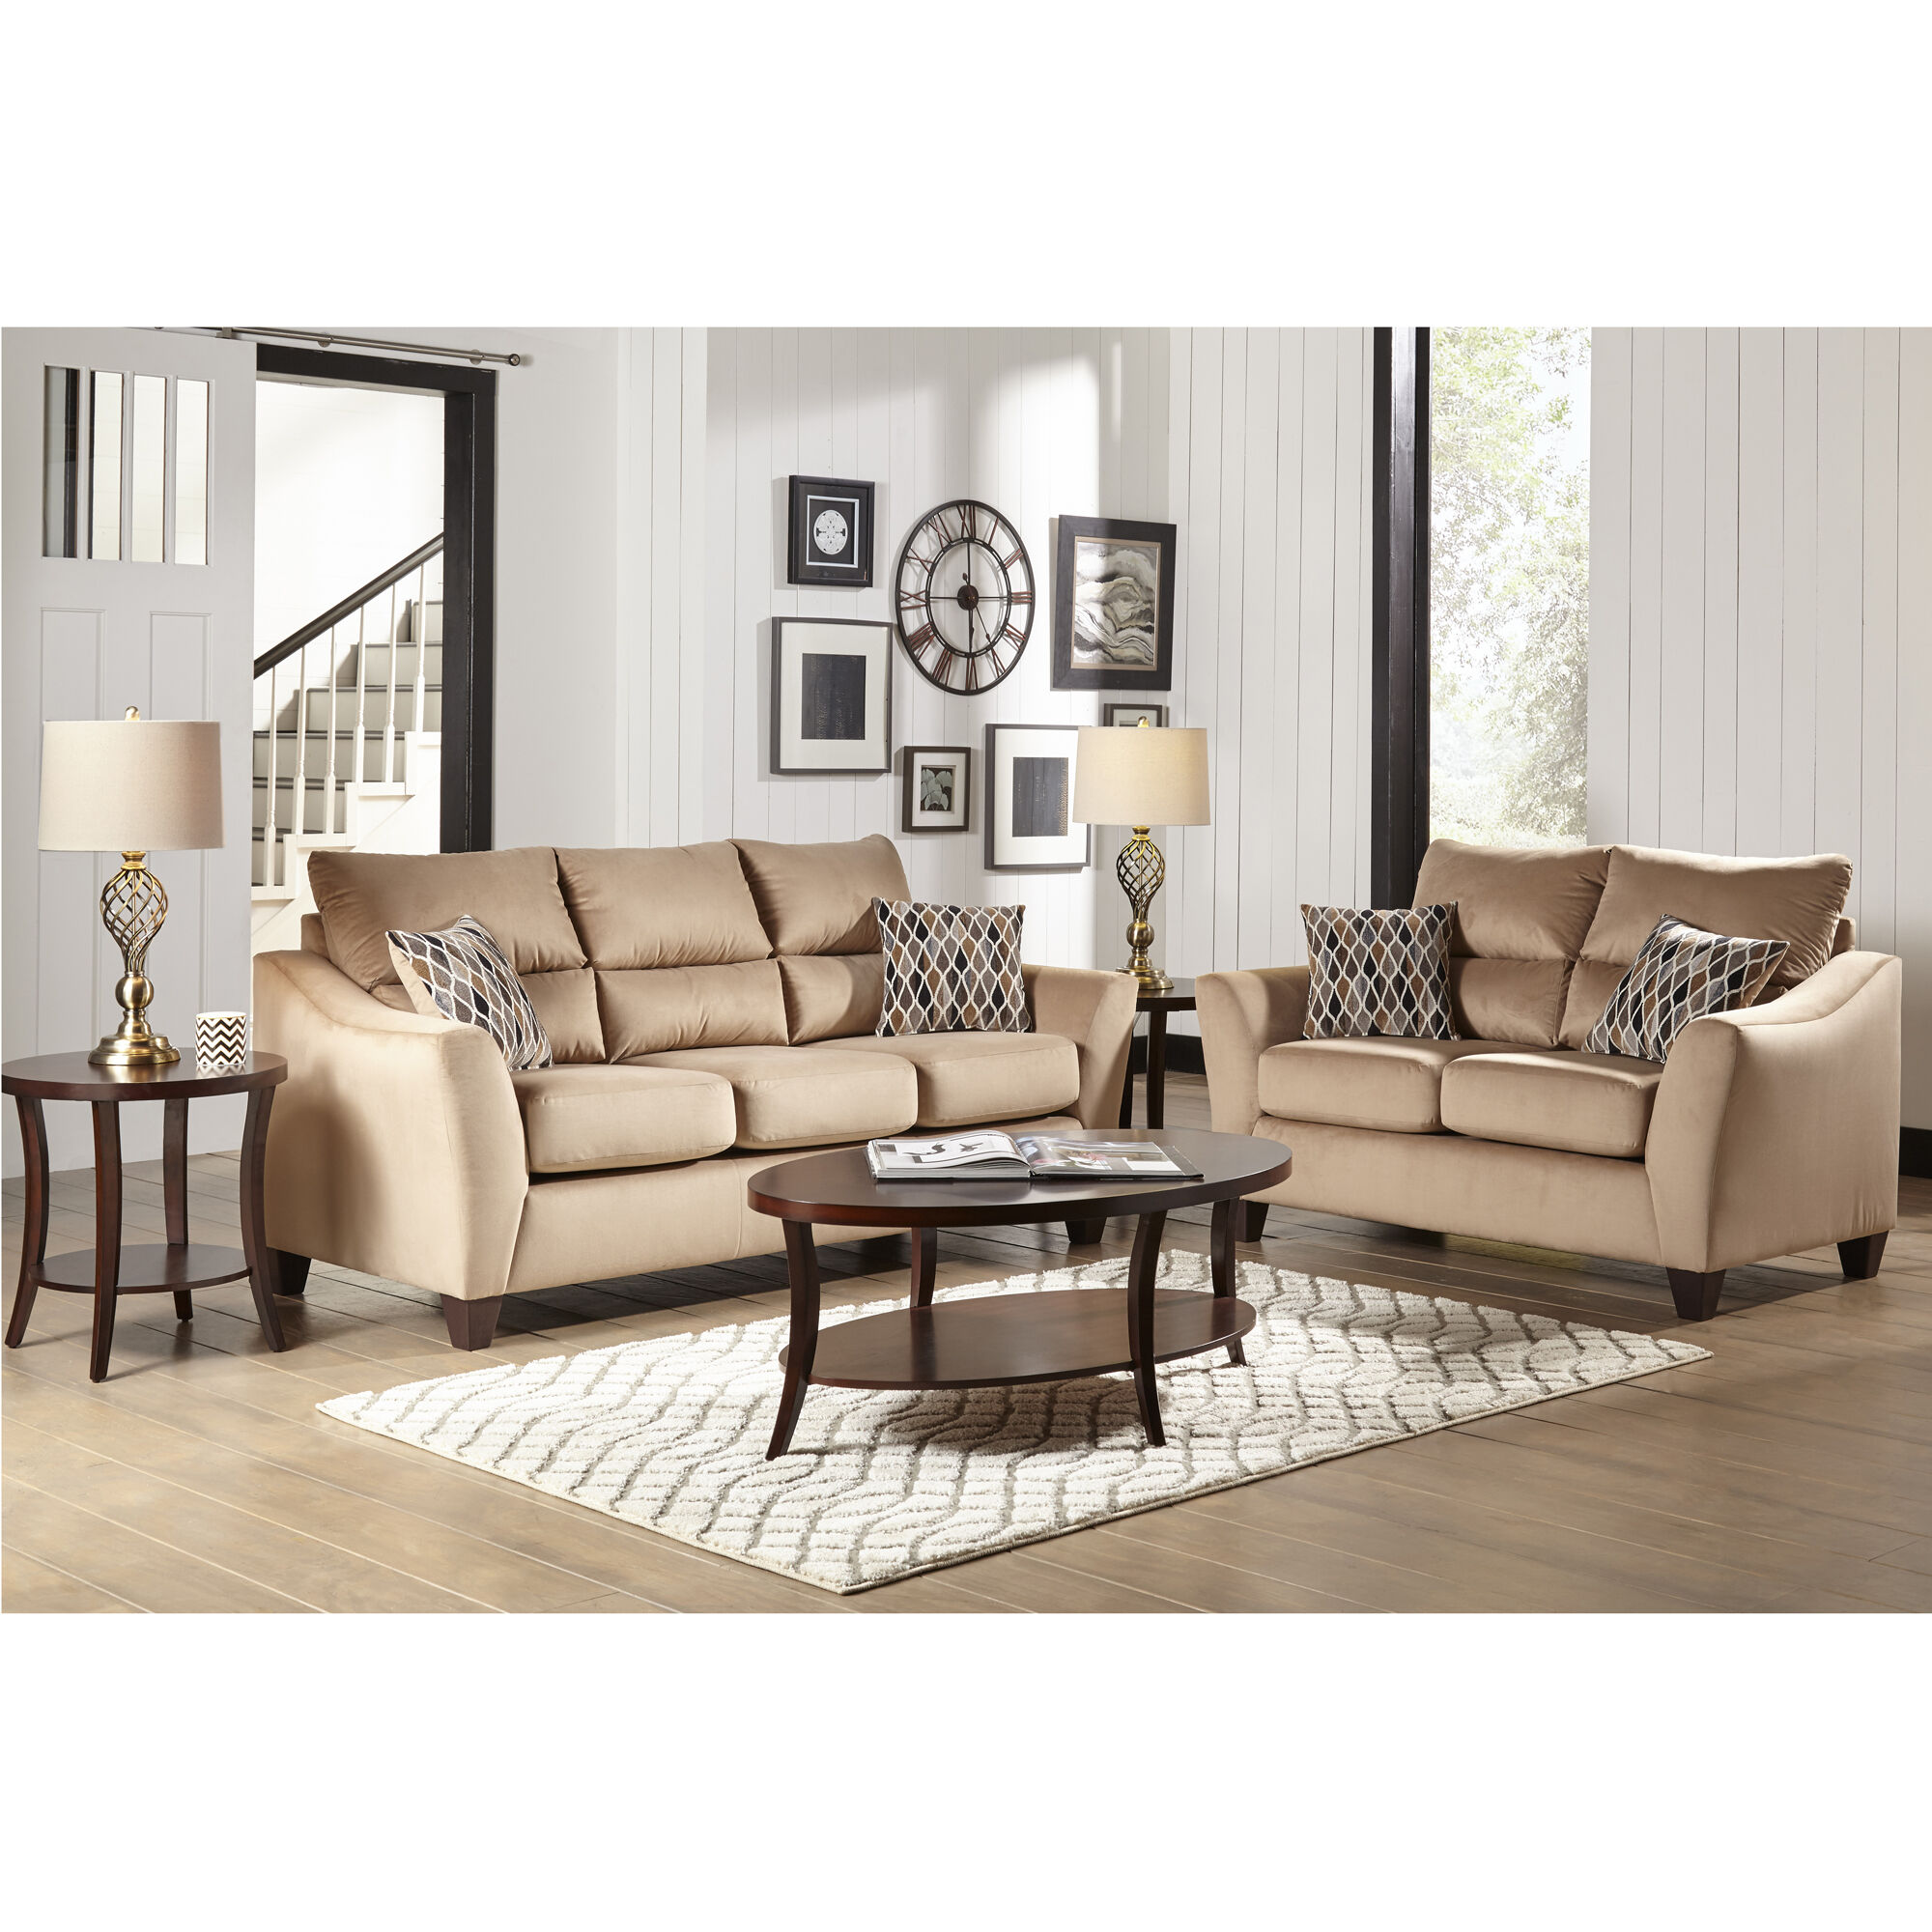 woodhaven living room furniture grey decor industries sofa & loveseat sets 2-piece camden ...